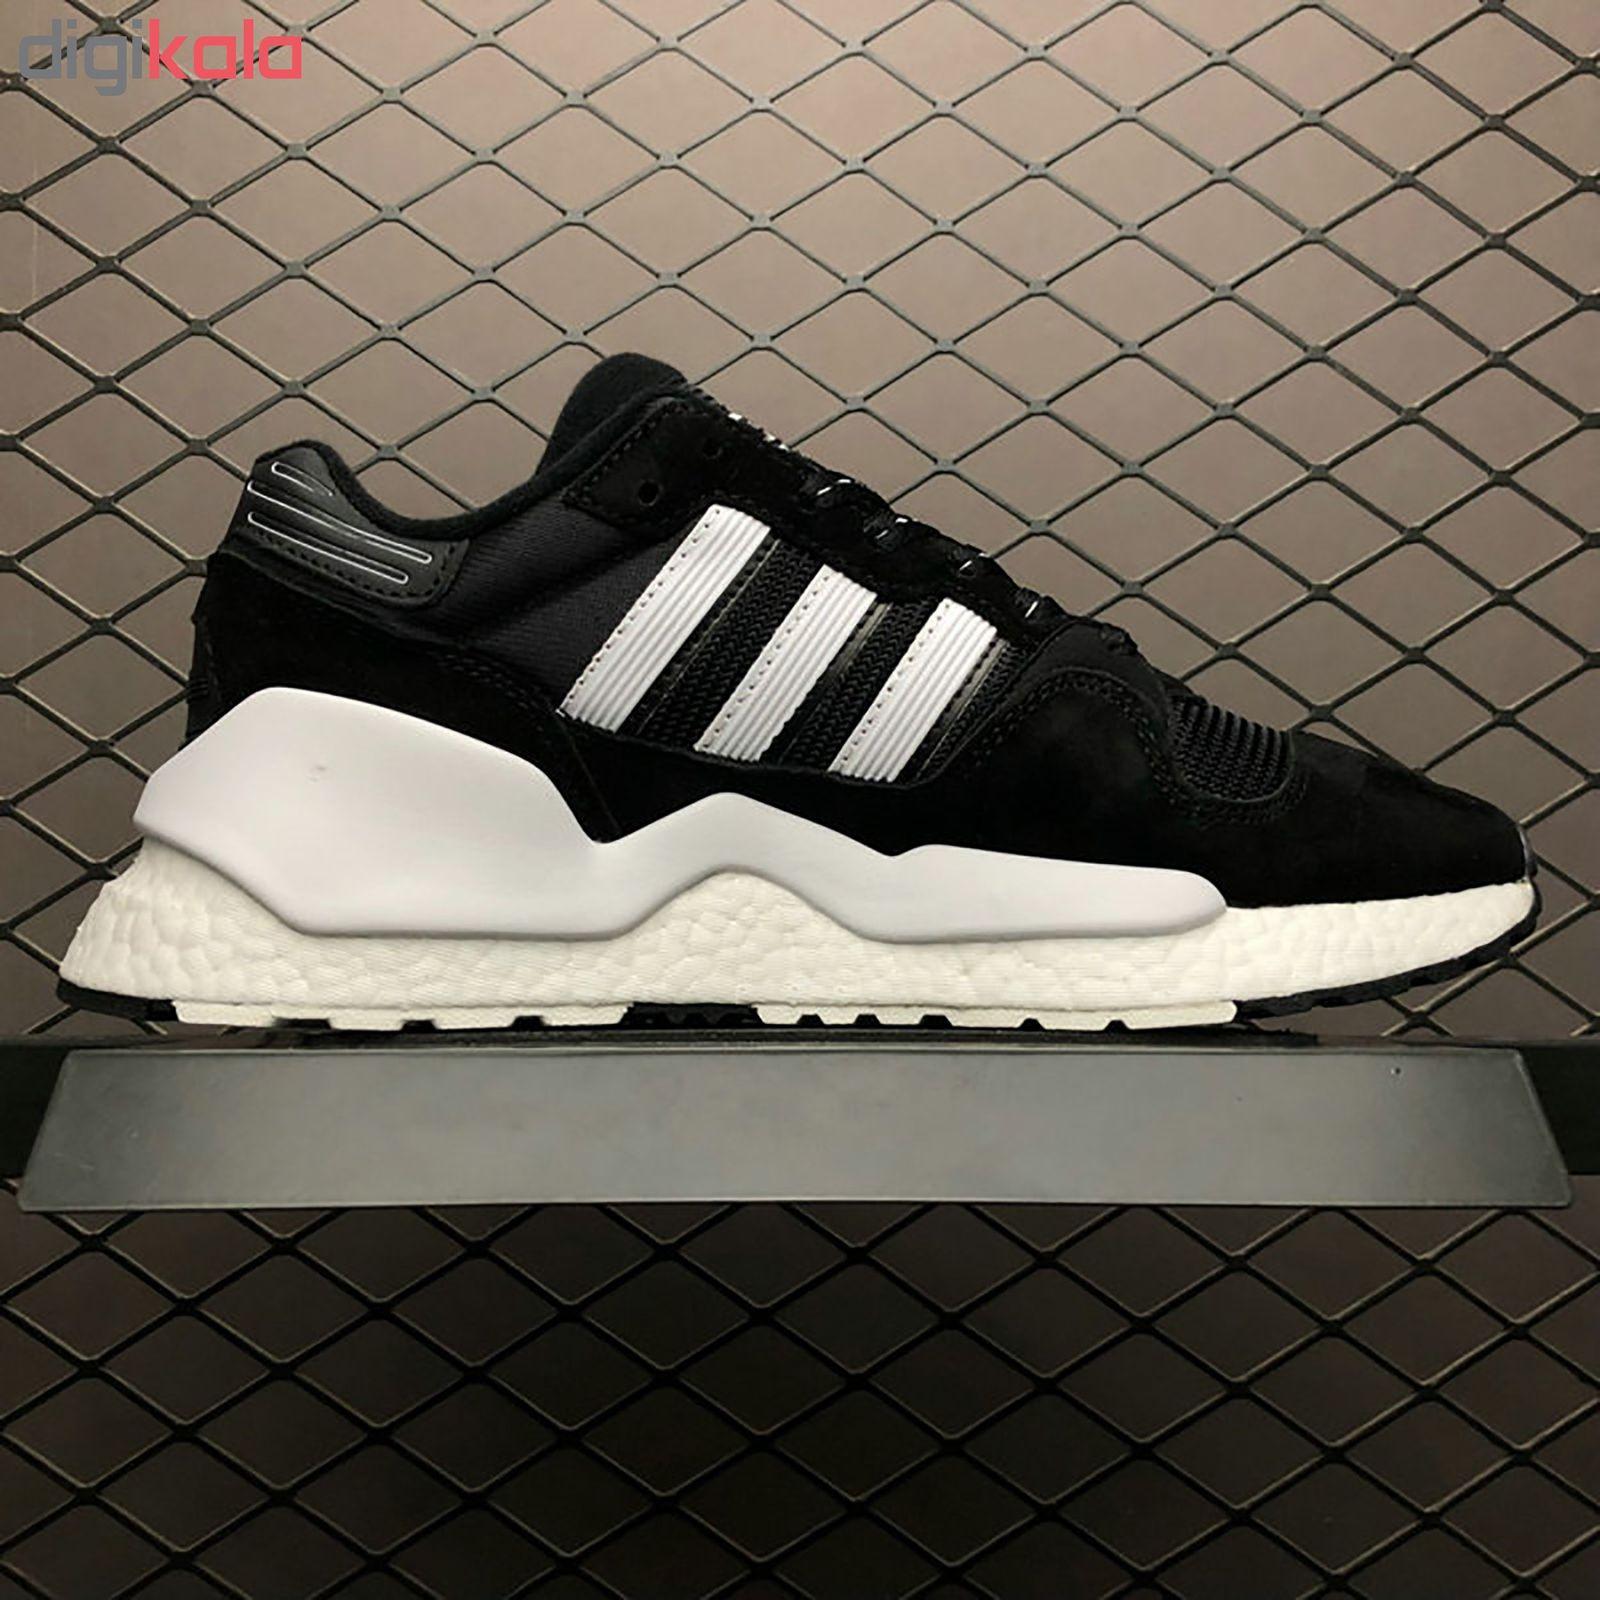 کفش مخصوص پیاده روی مردانه آدیداس مدل EQT - ZX500 Boost - G26808